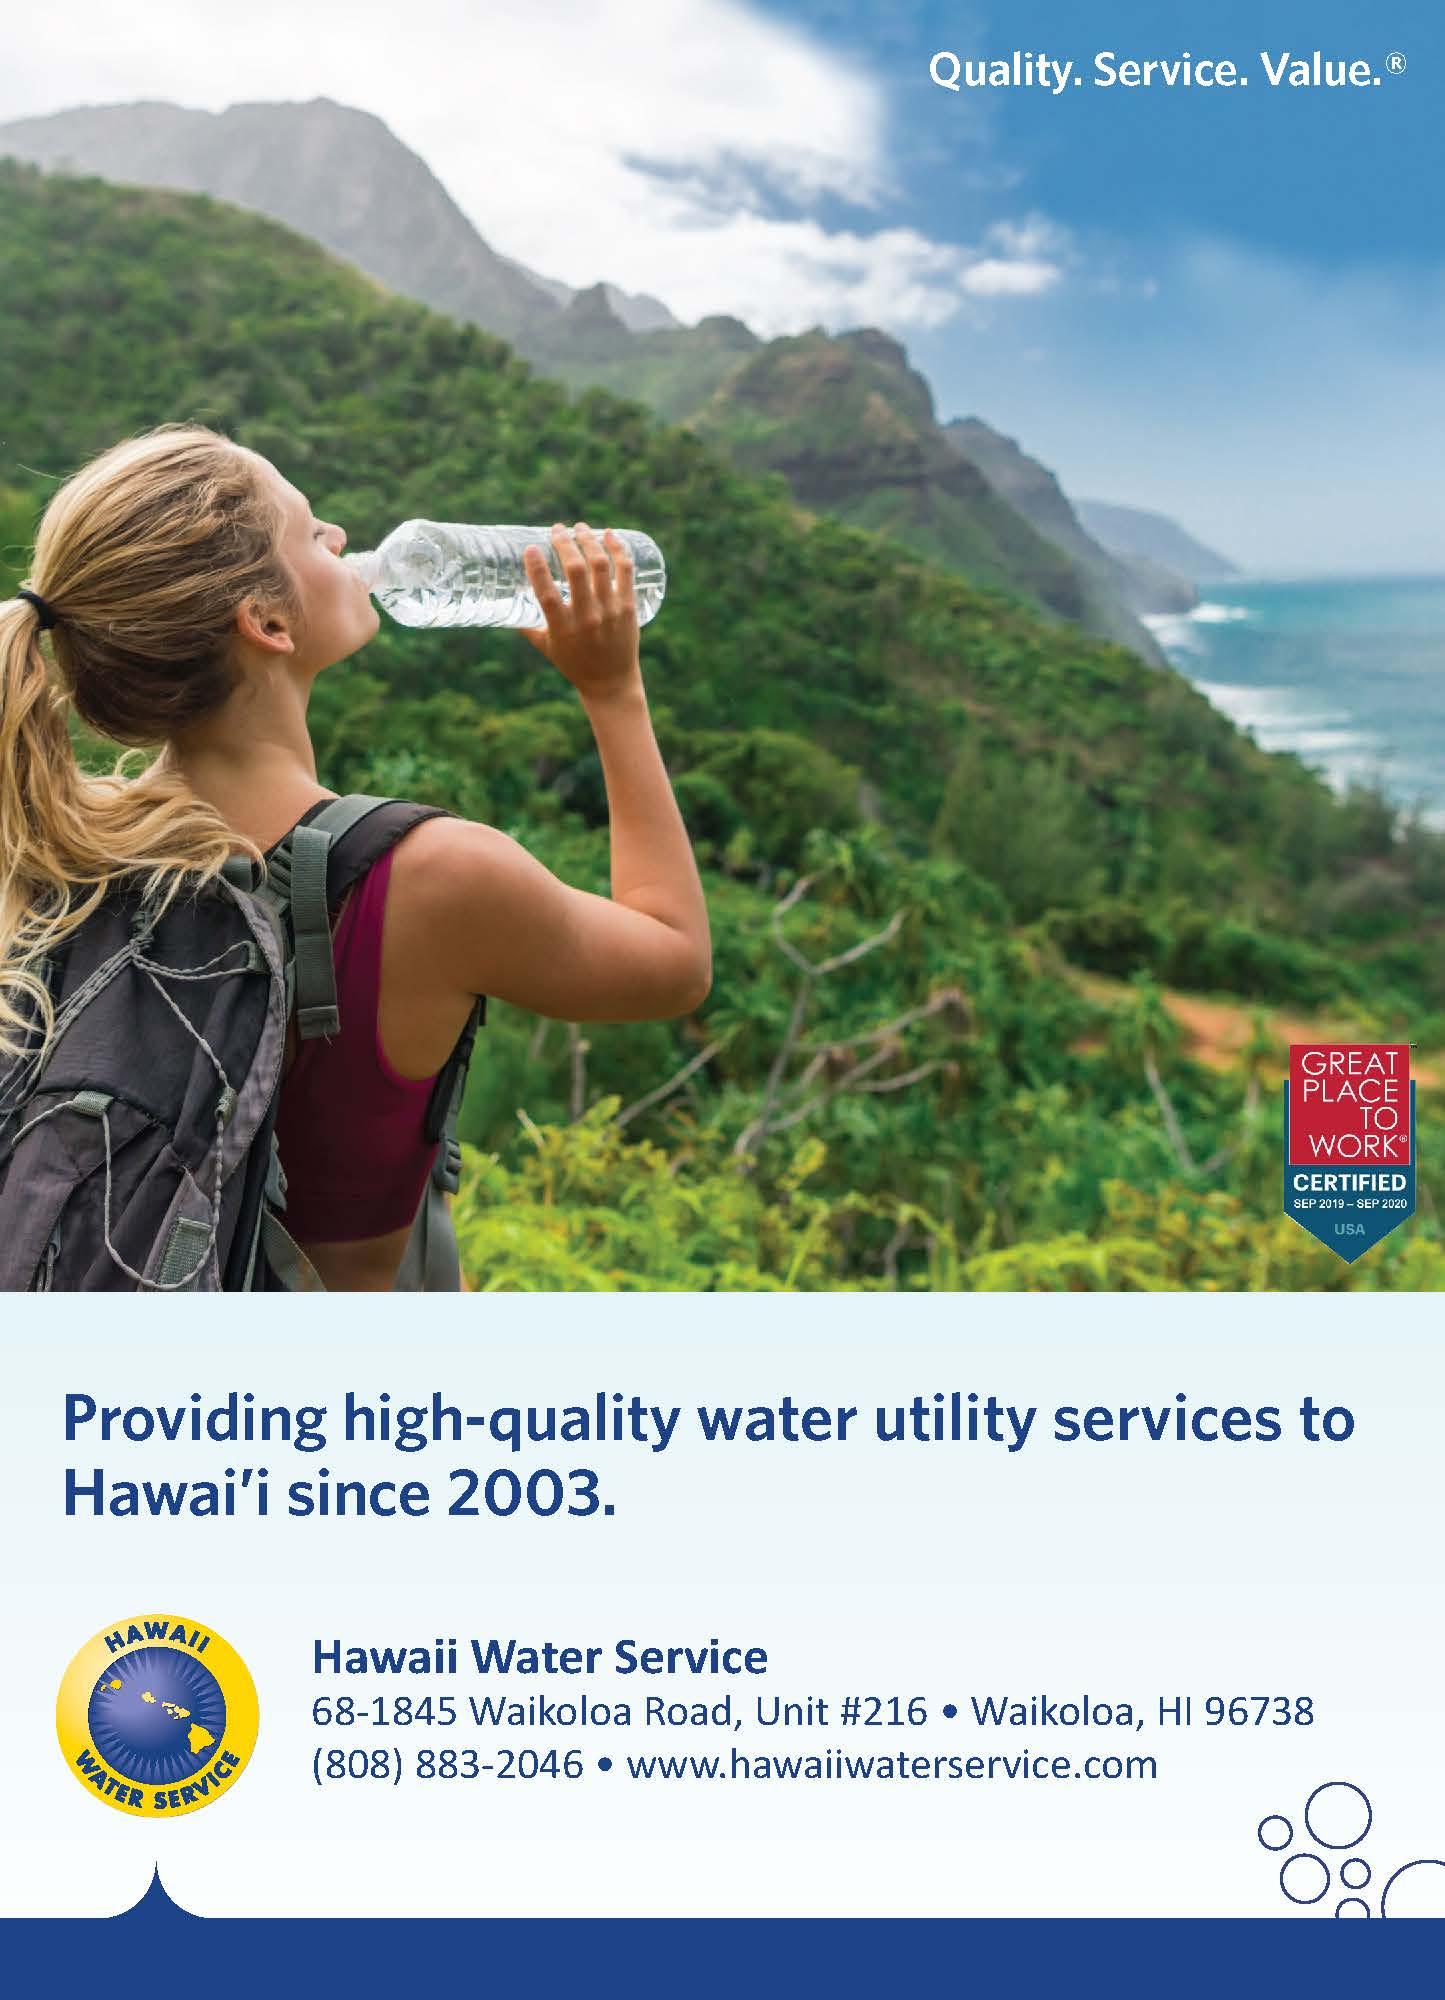 Hawaii-Water-Svc-MM-8.2021.jpg